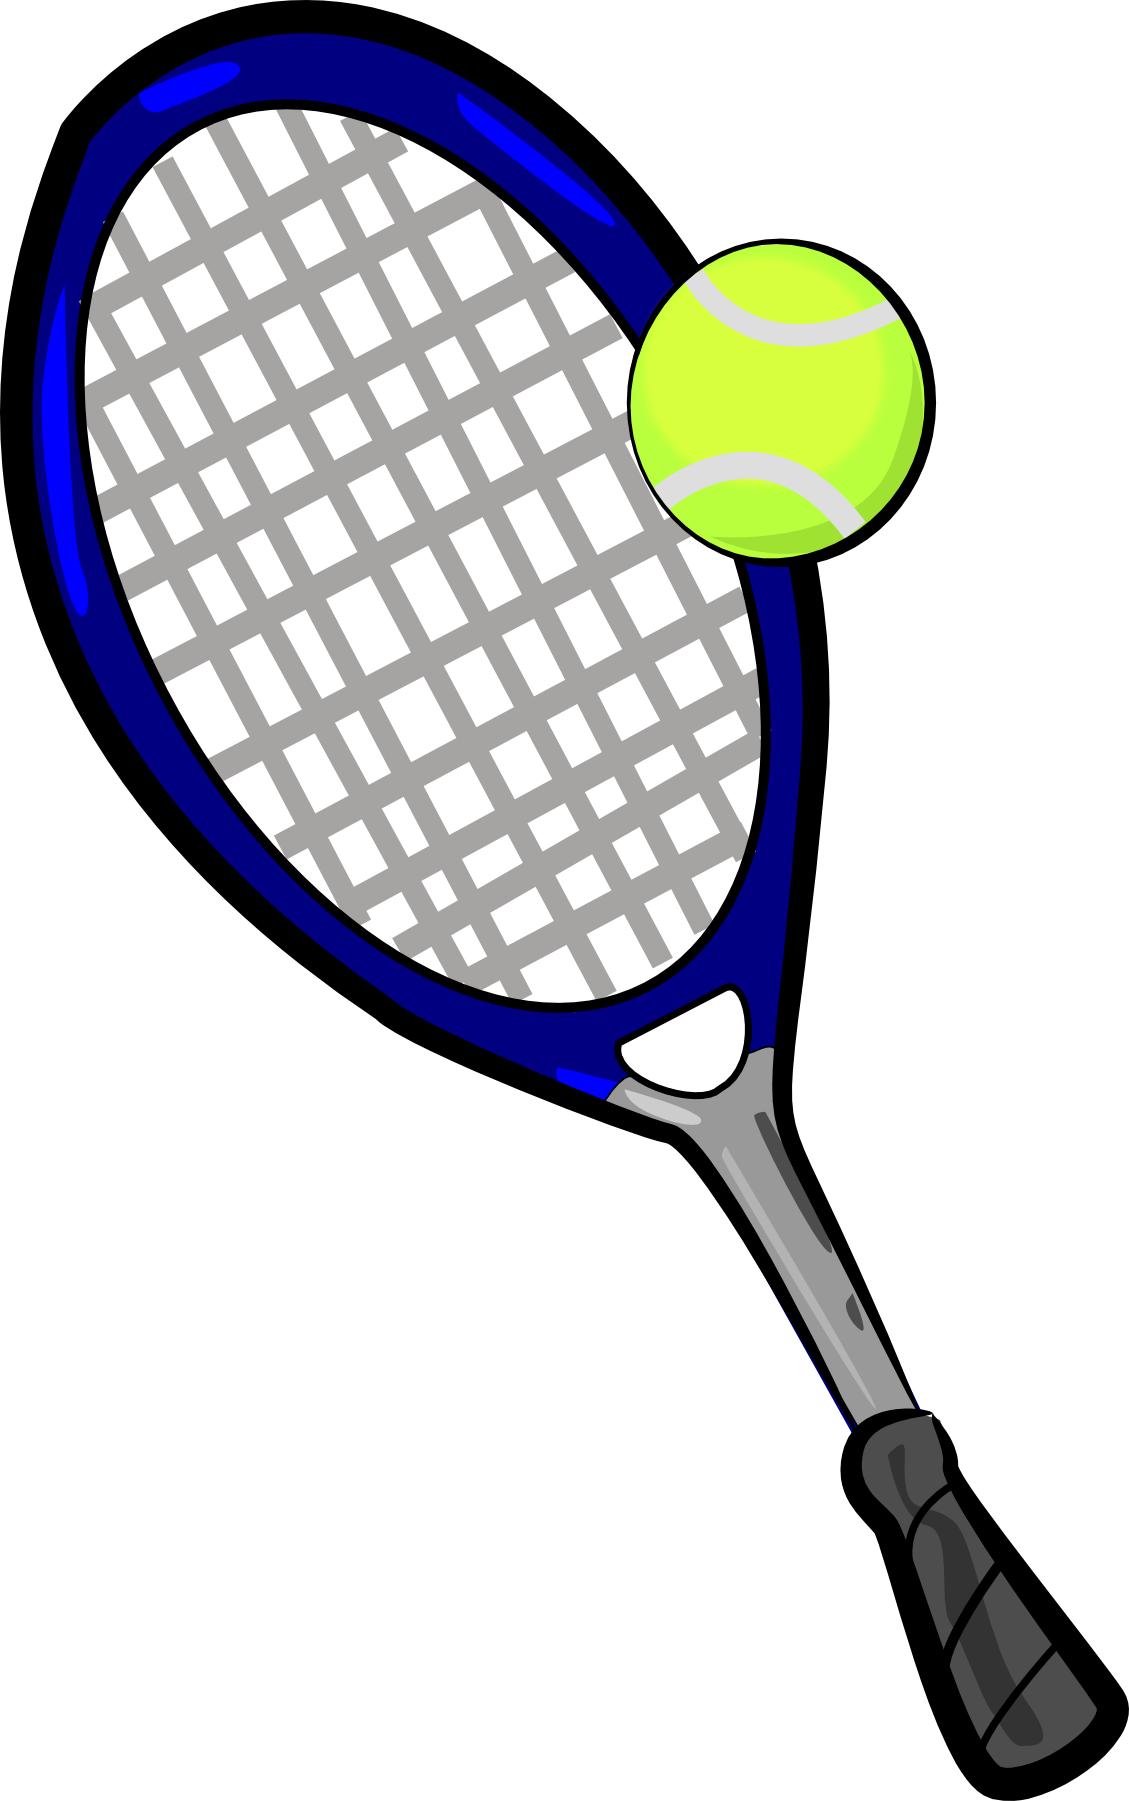 1129x1801 Tennis Ball Clip Art Vector 2